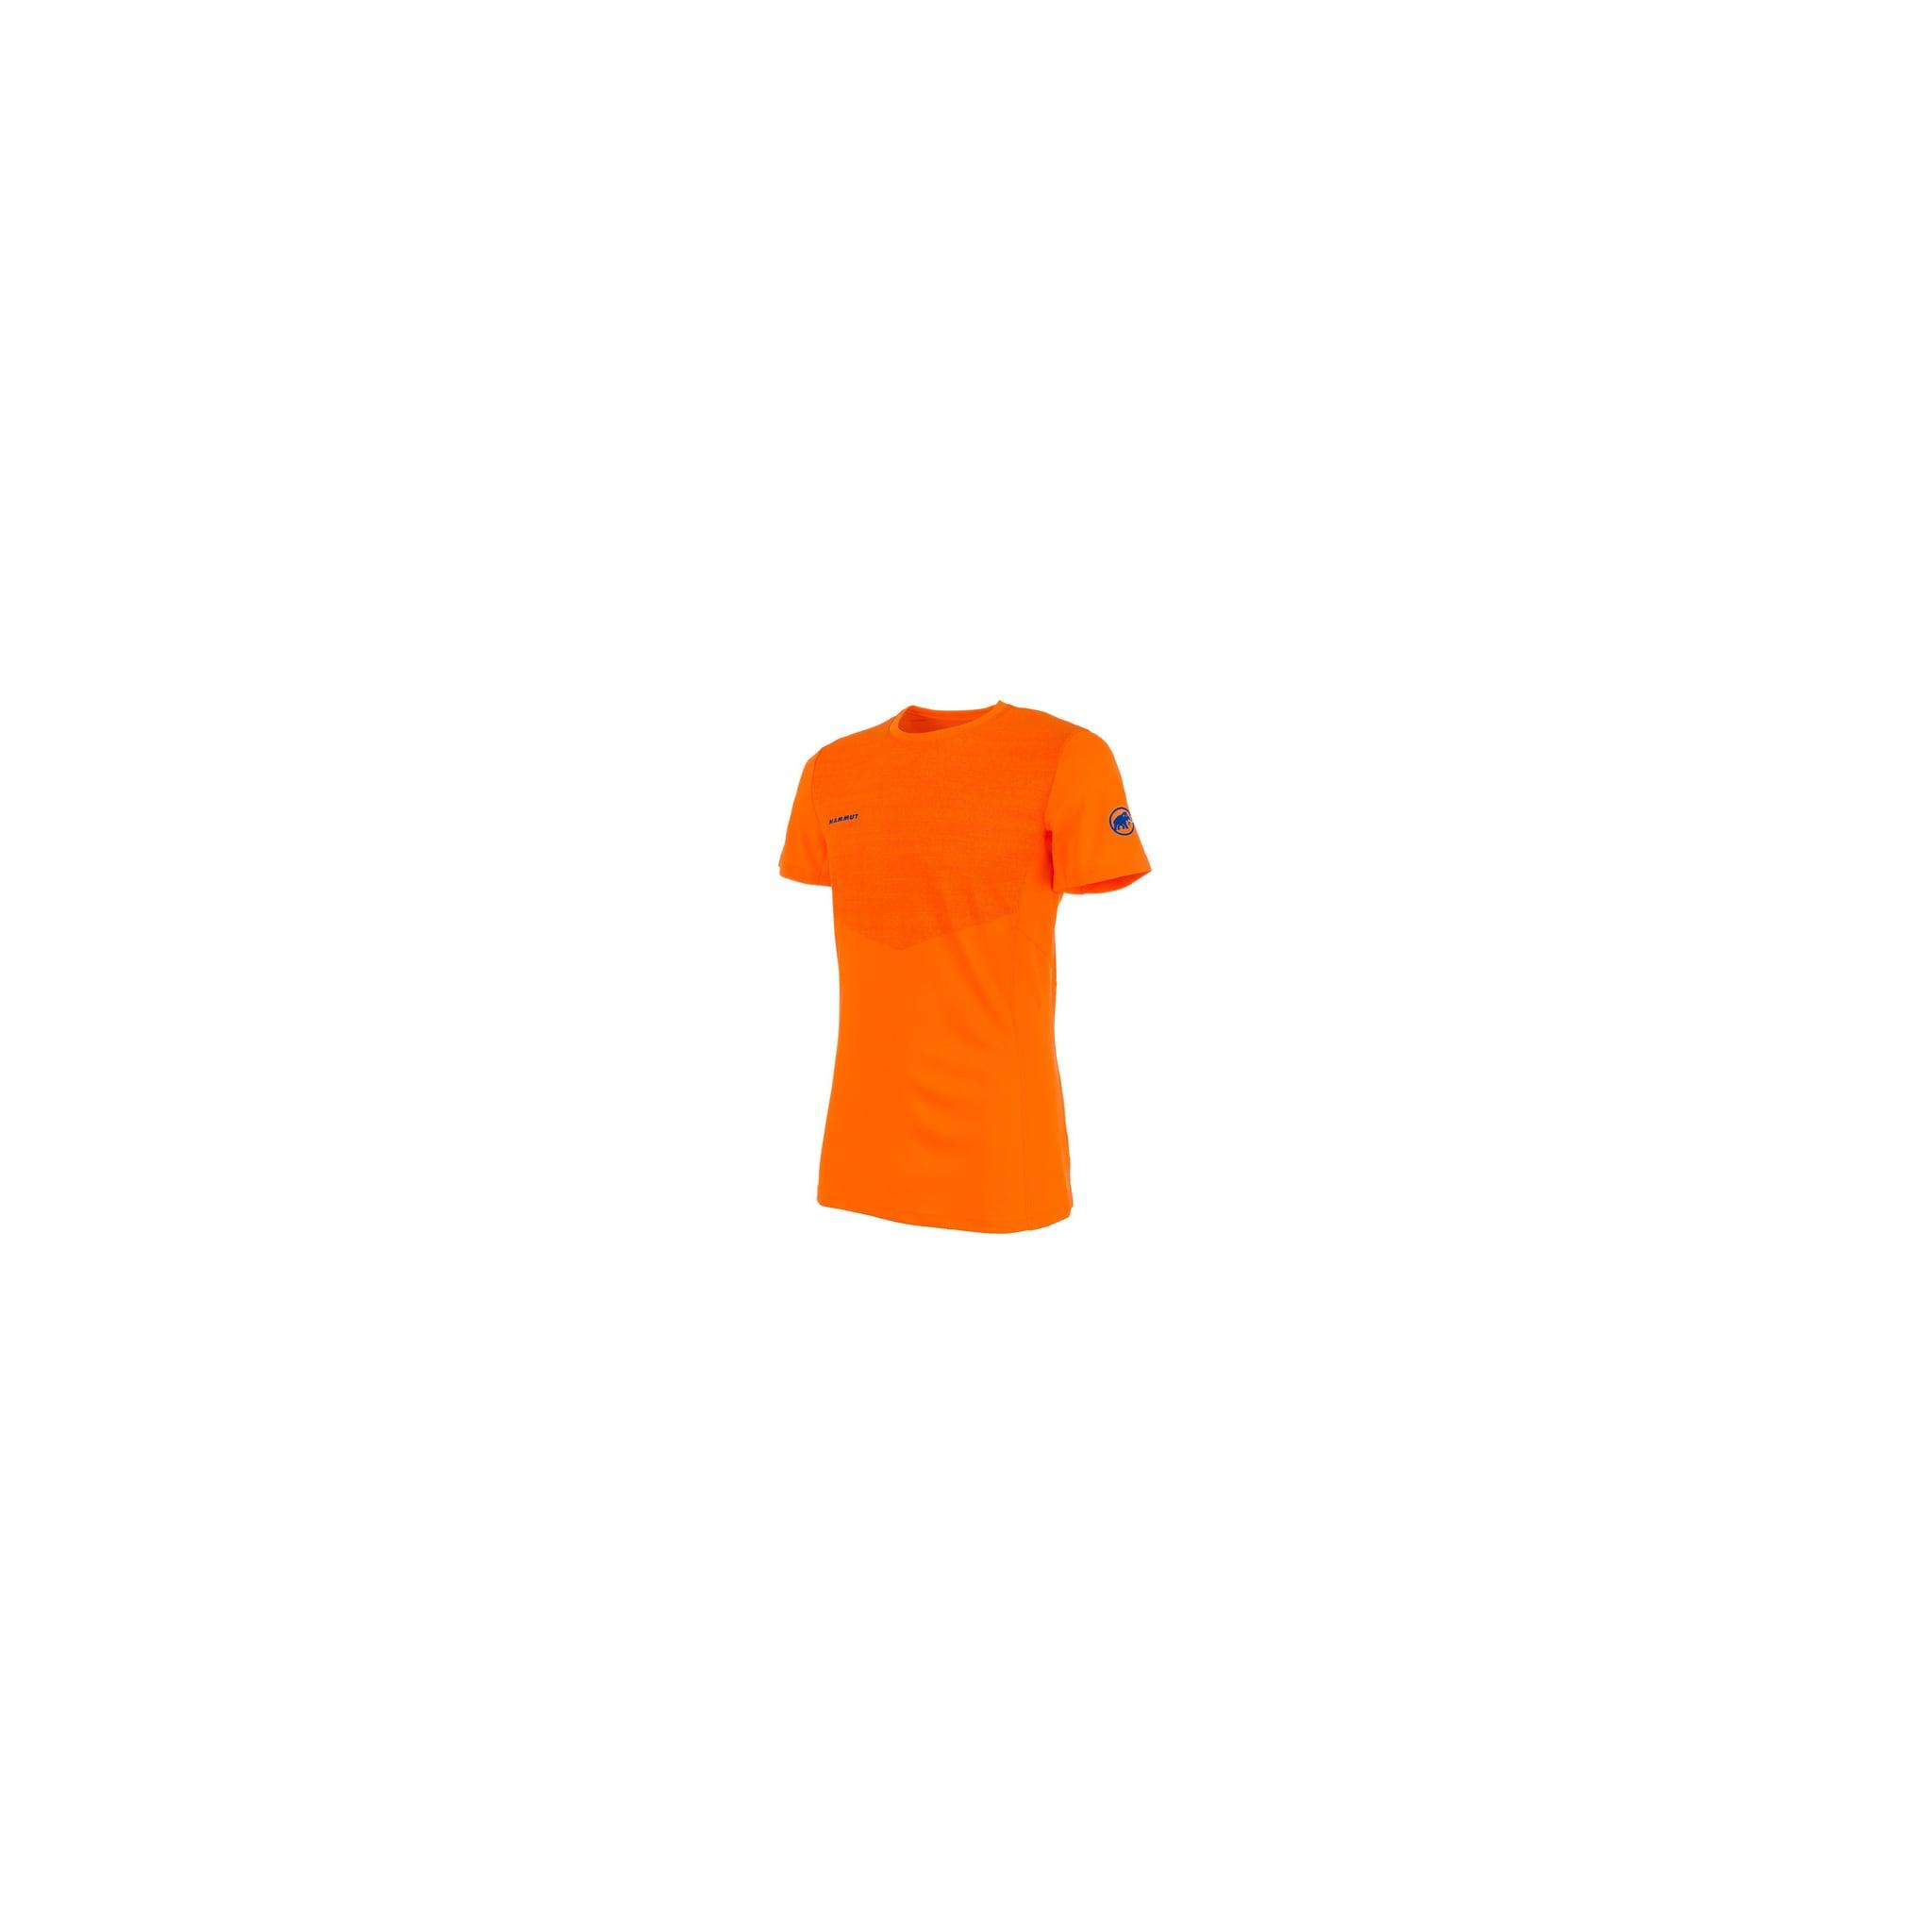 Moench Light T-Shirt Ms